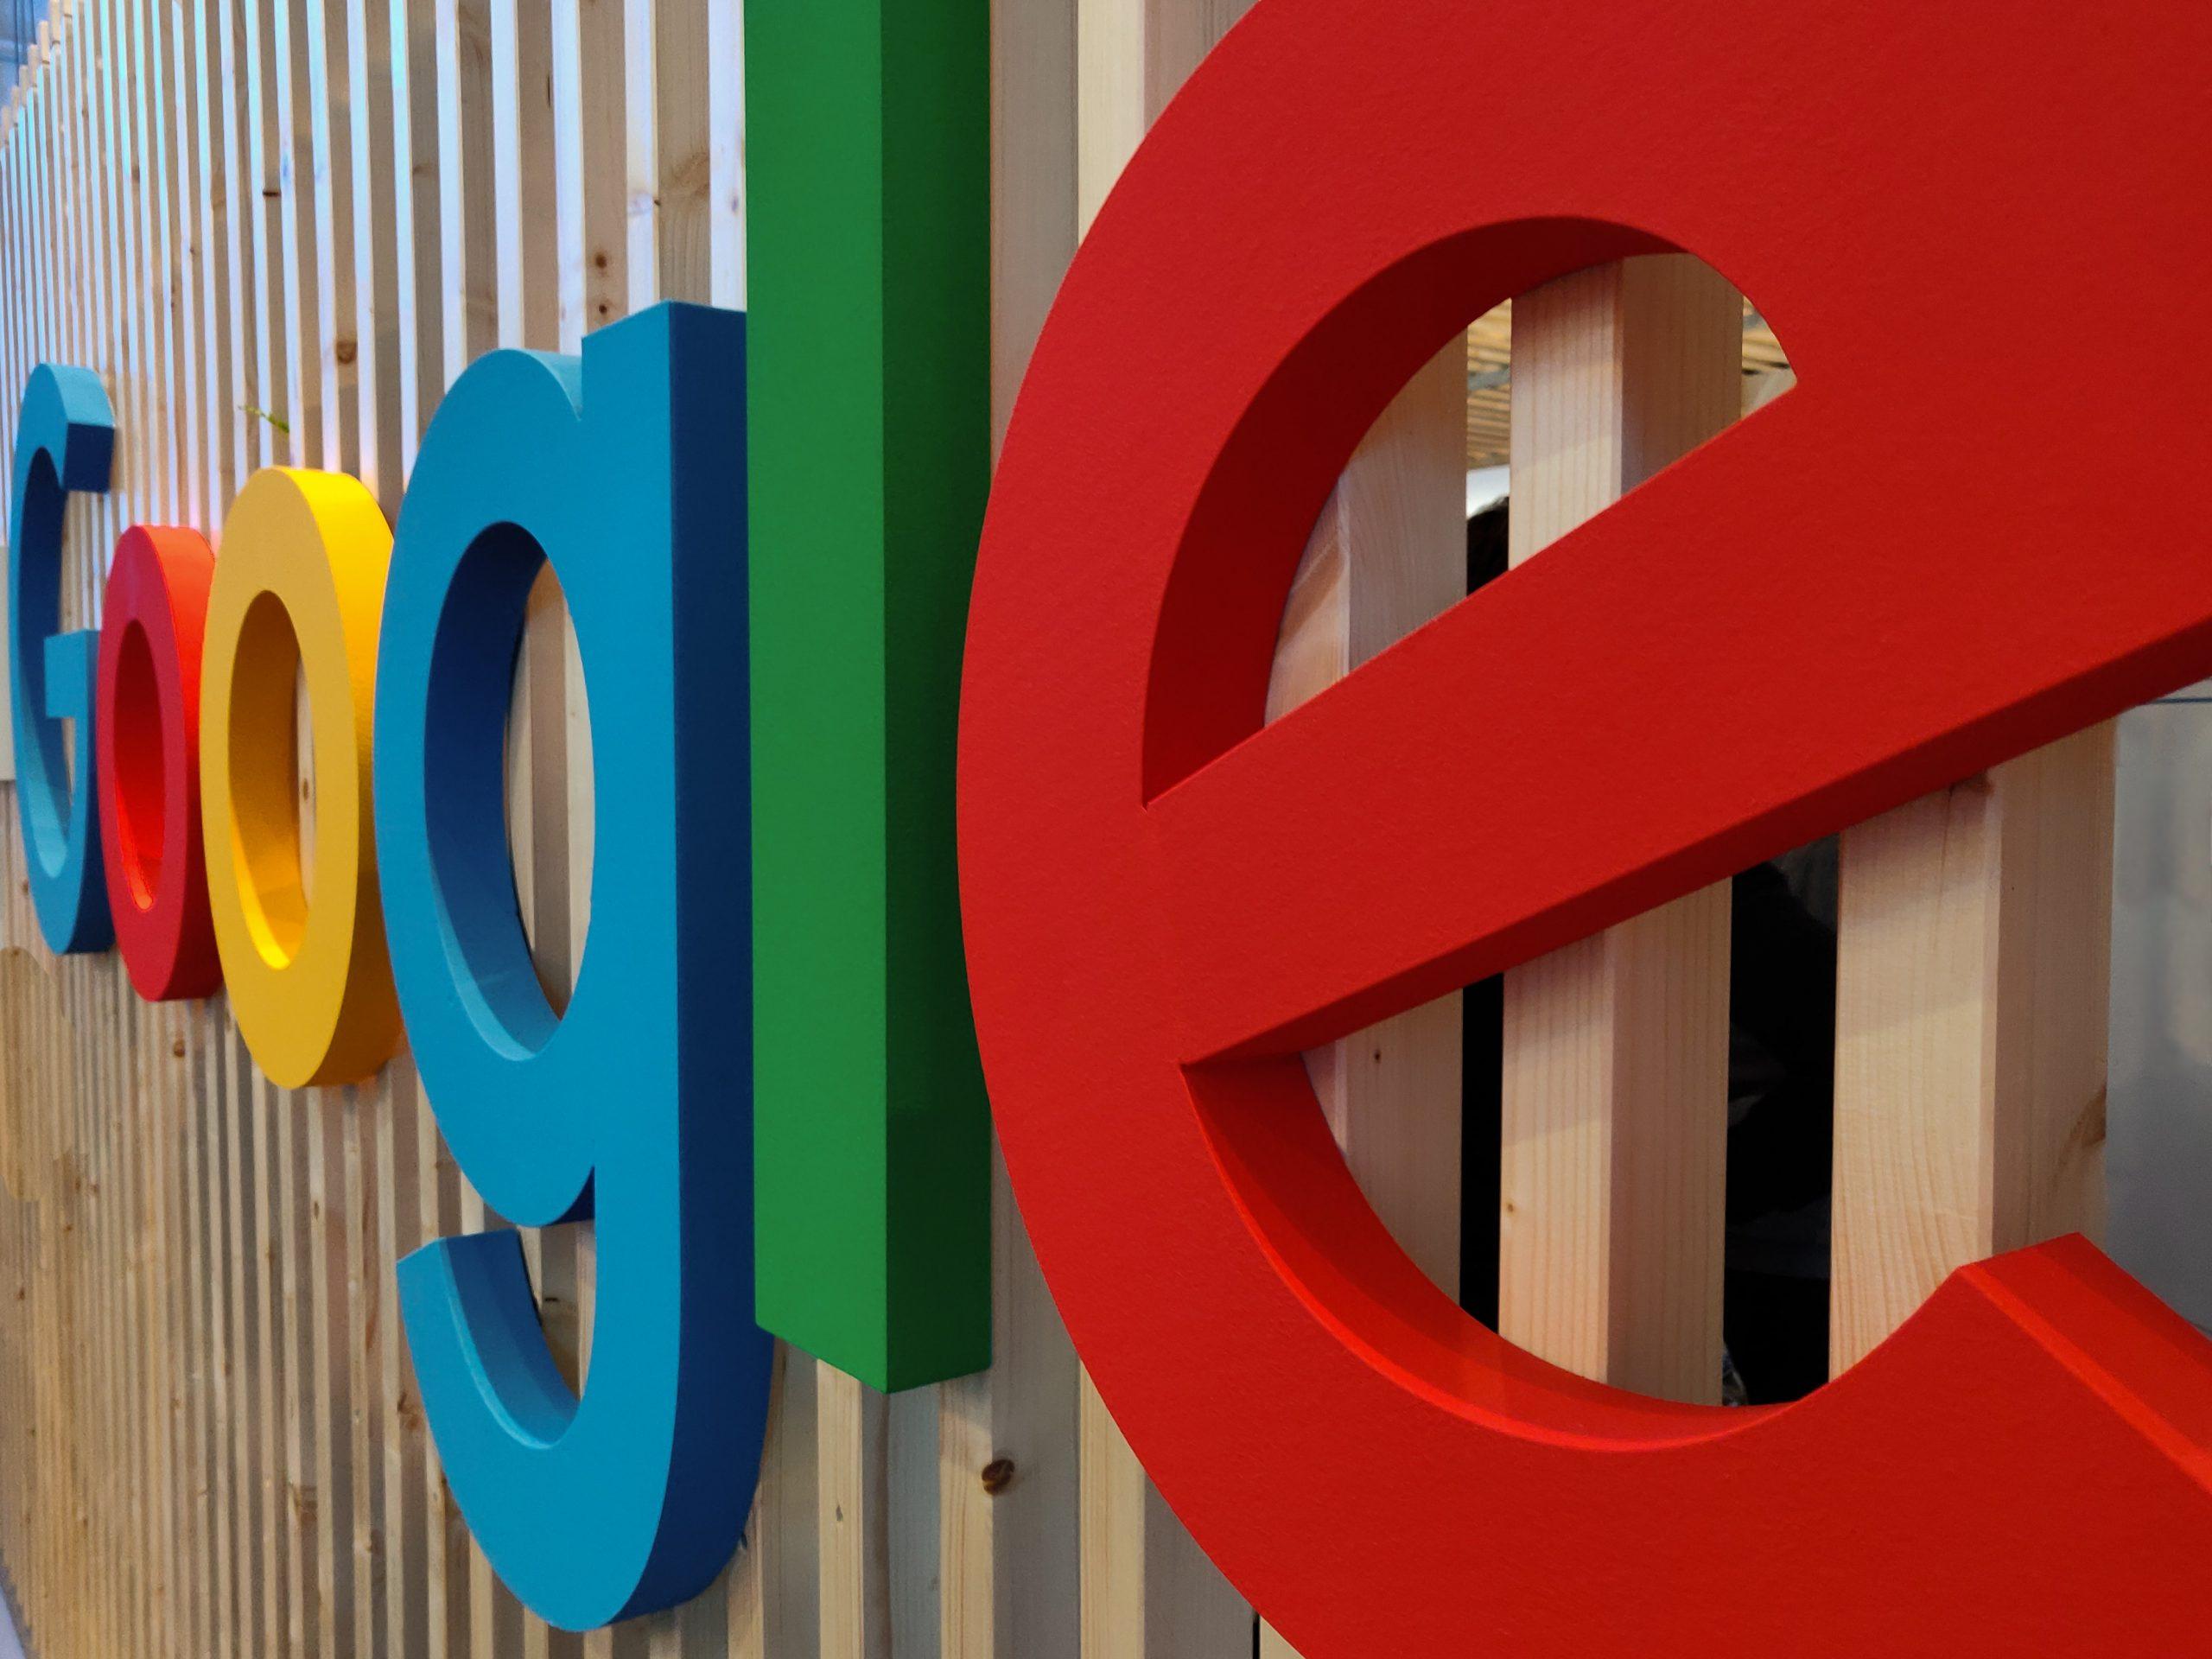 Dev arama motoru Google 23 yaşında!